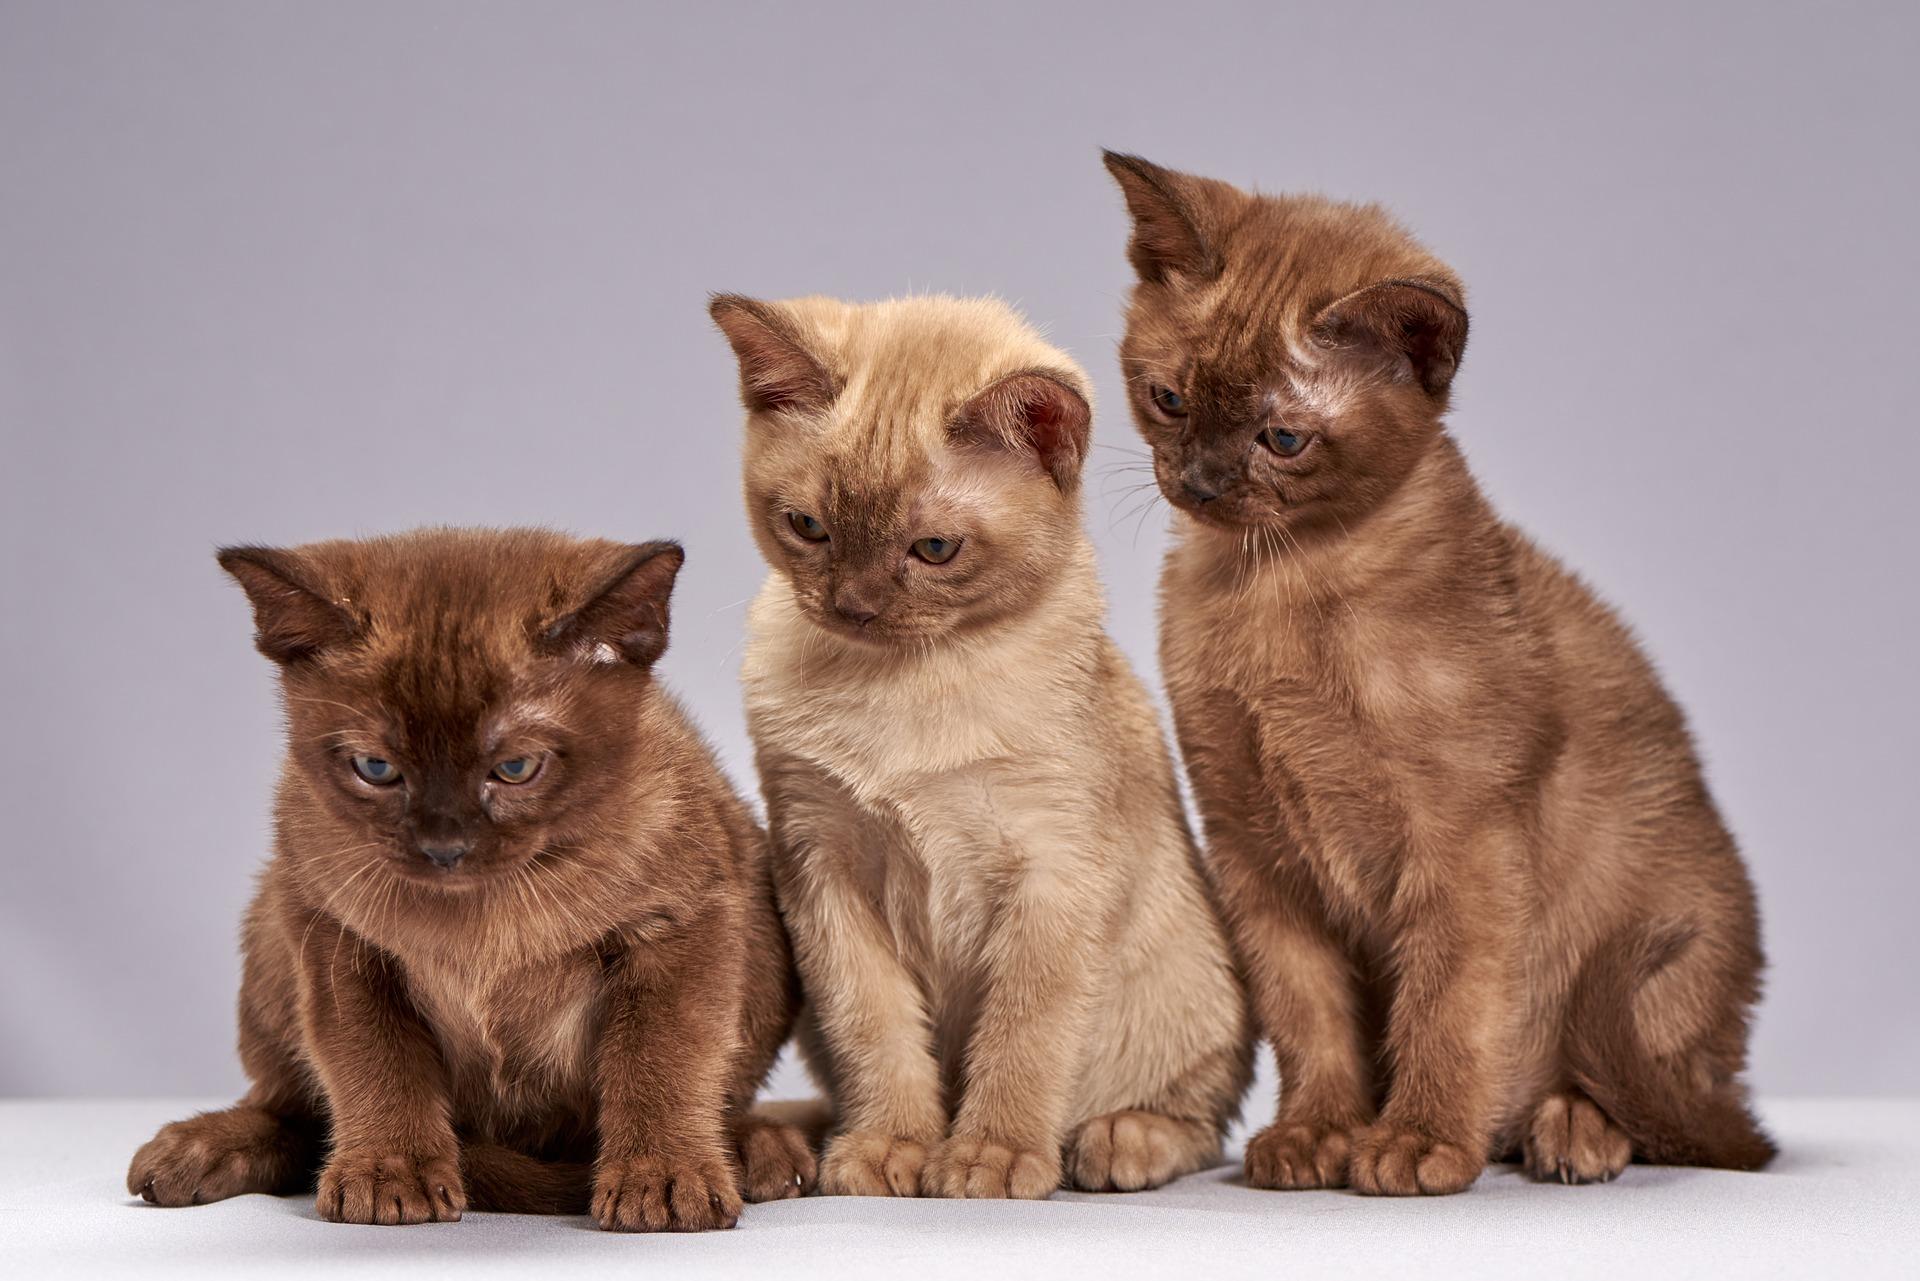 download wallpaper: schattige kittens wallpaper